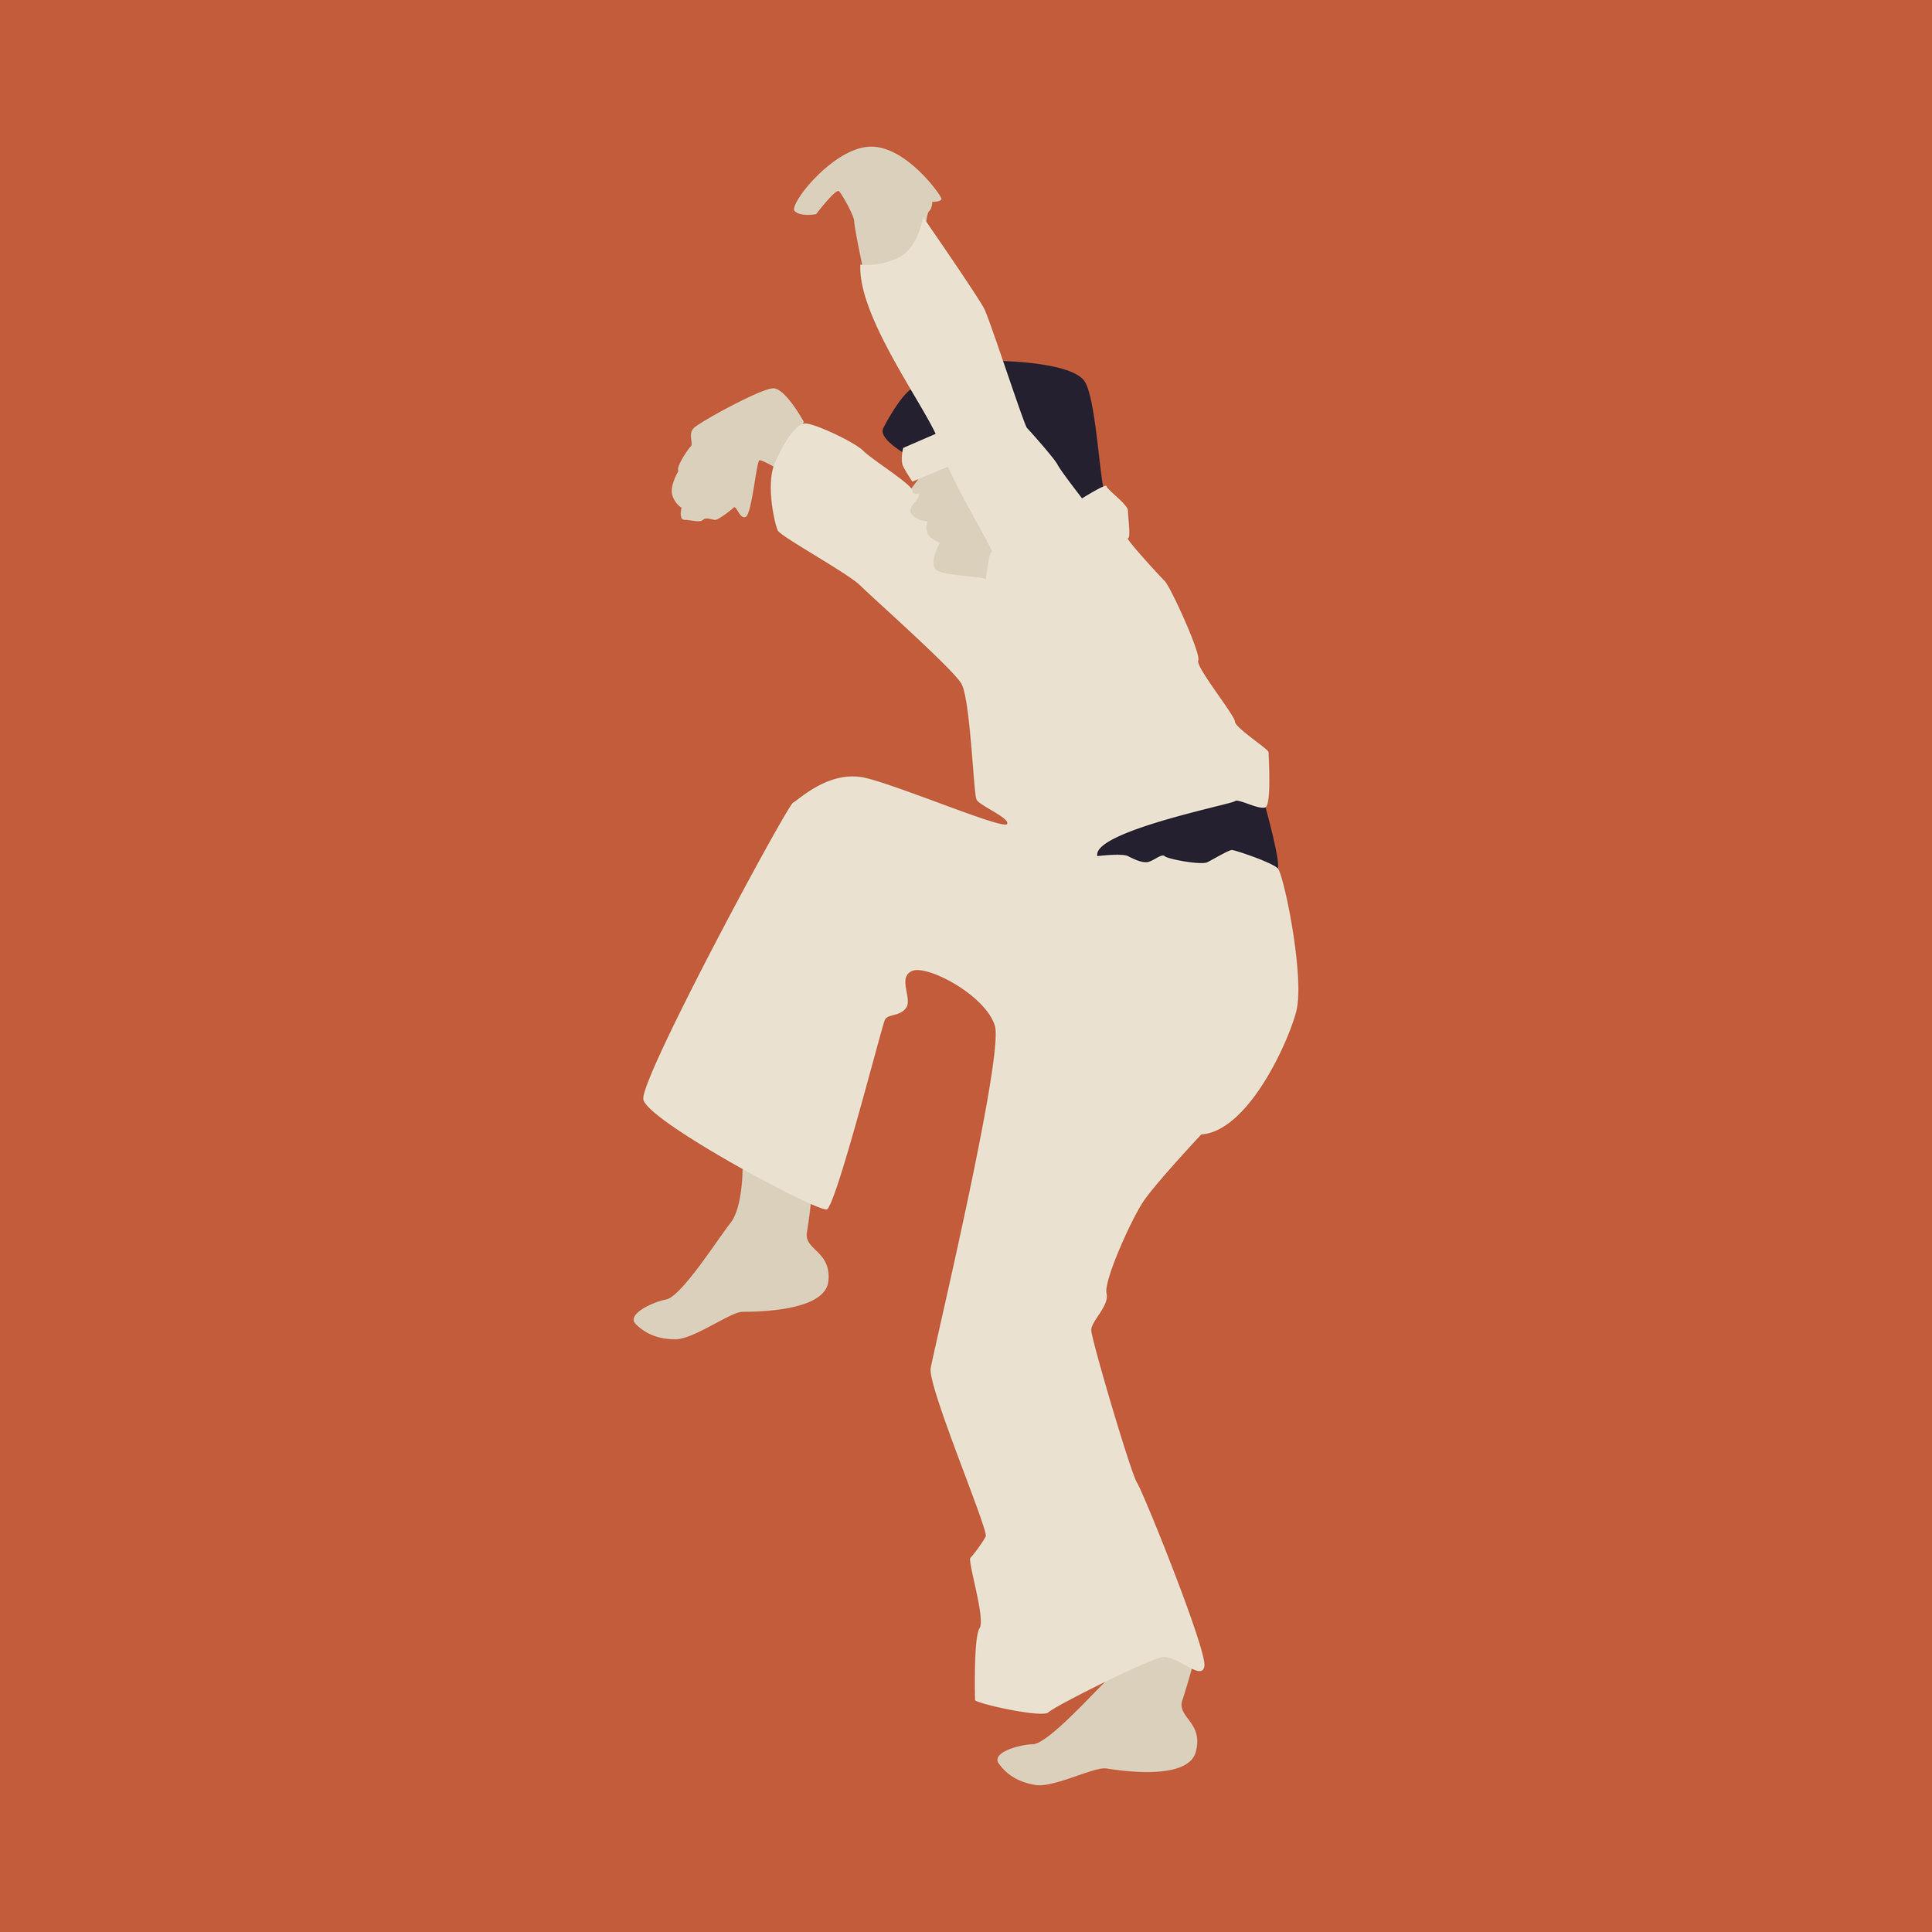 061 - The Karate Kid_Square.jpg